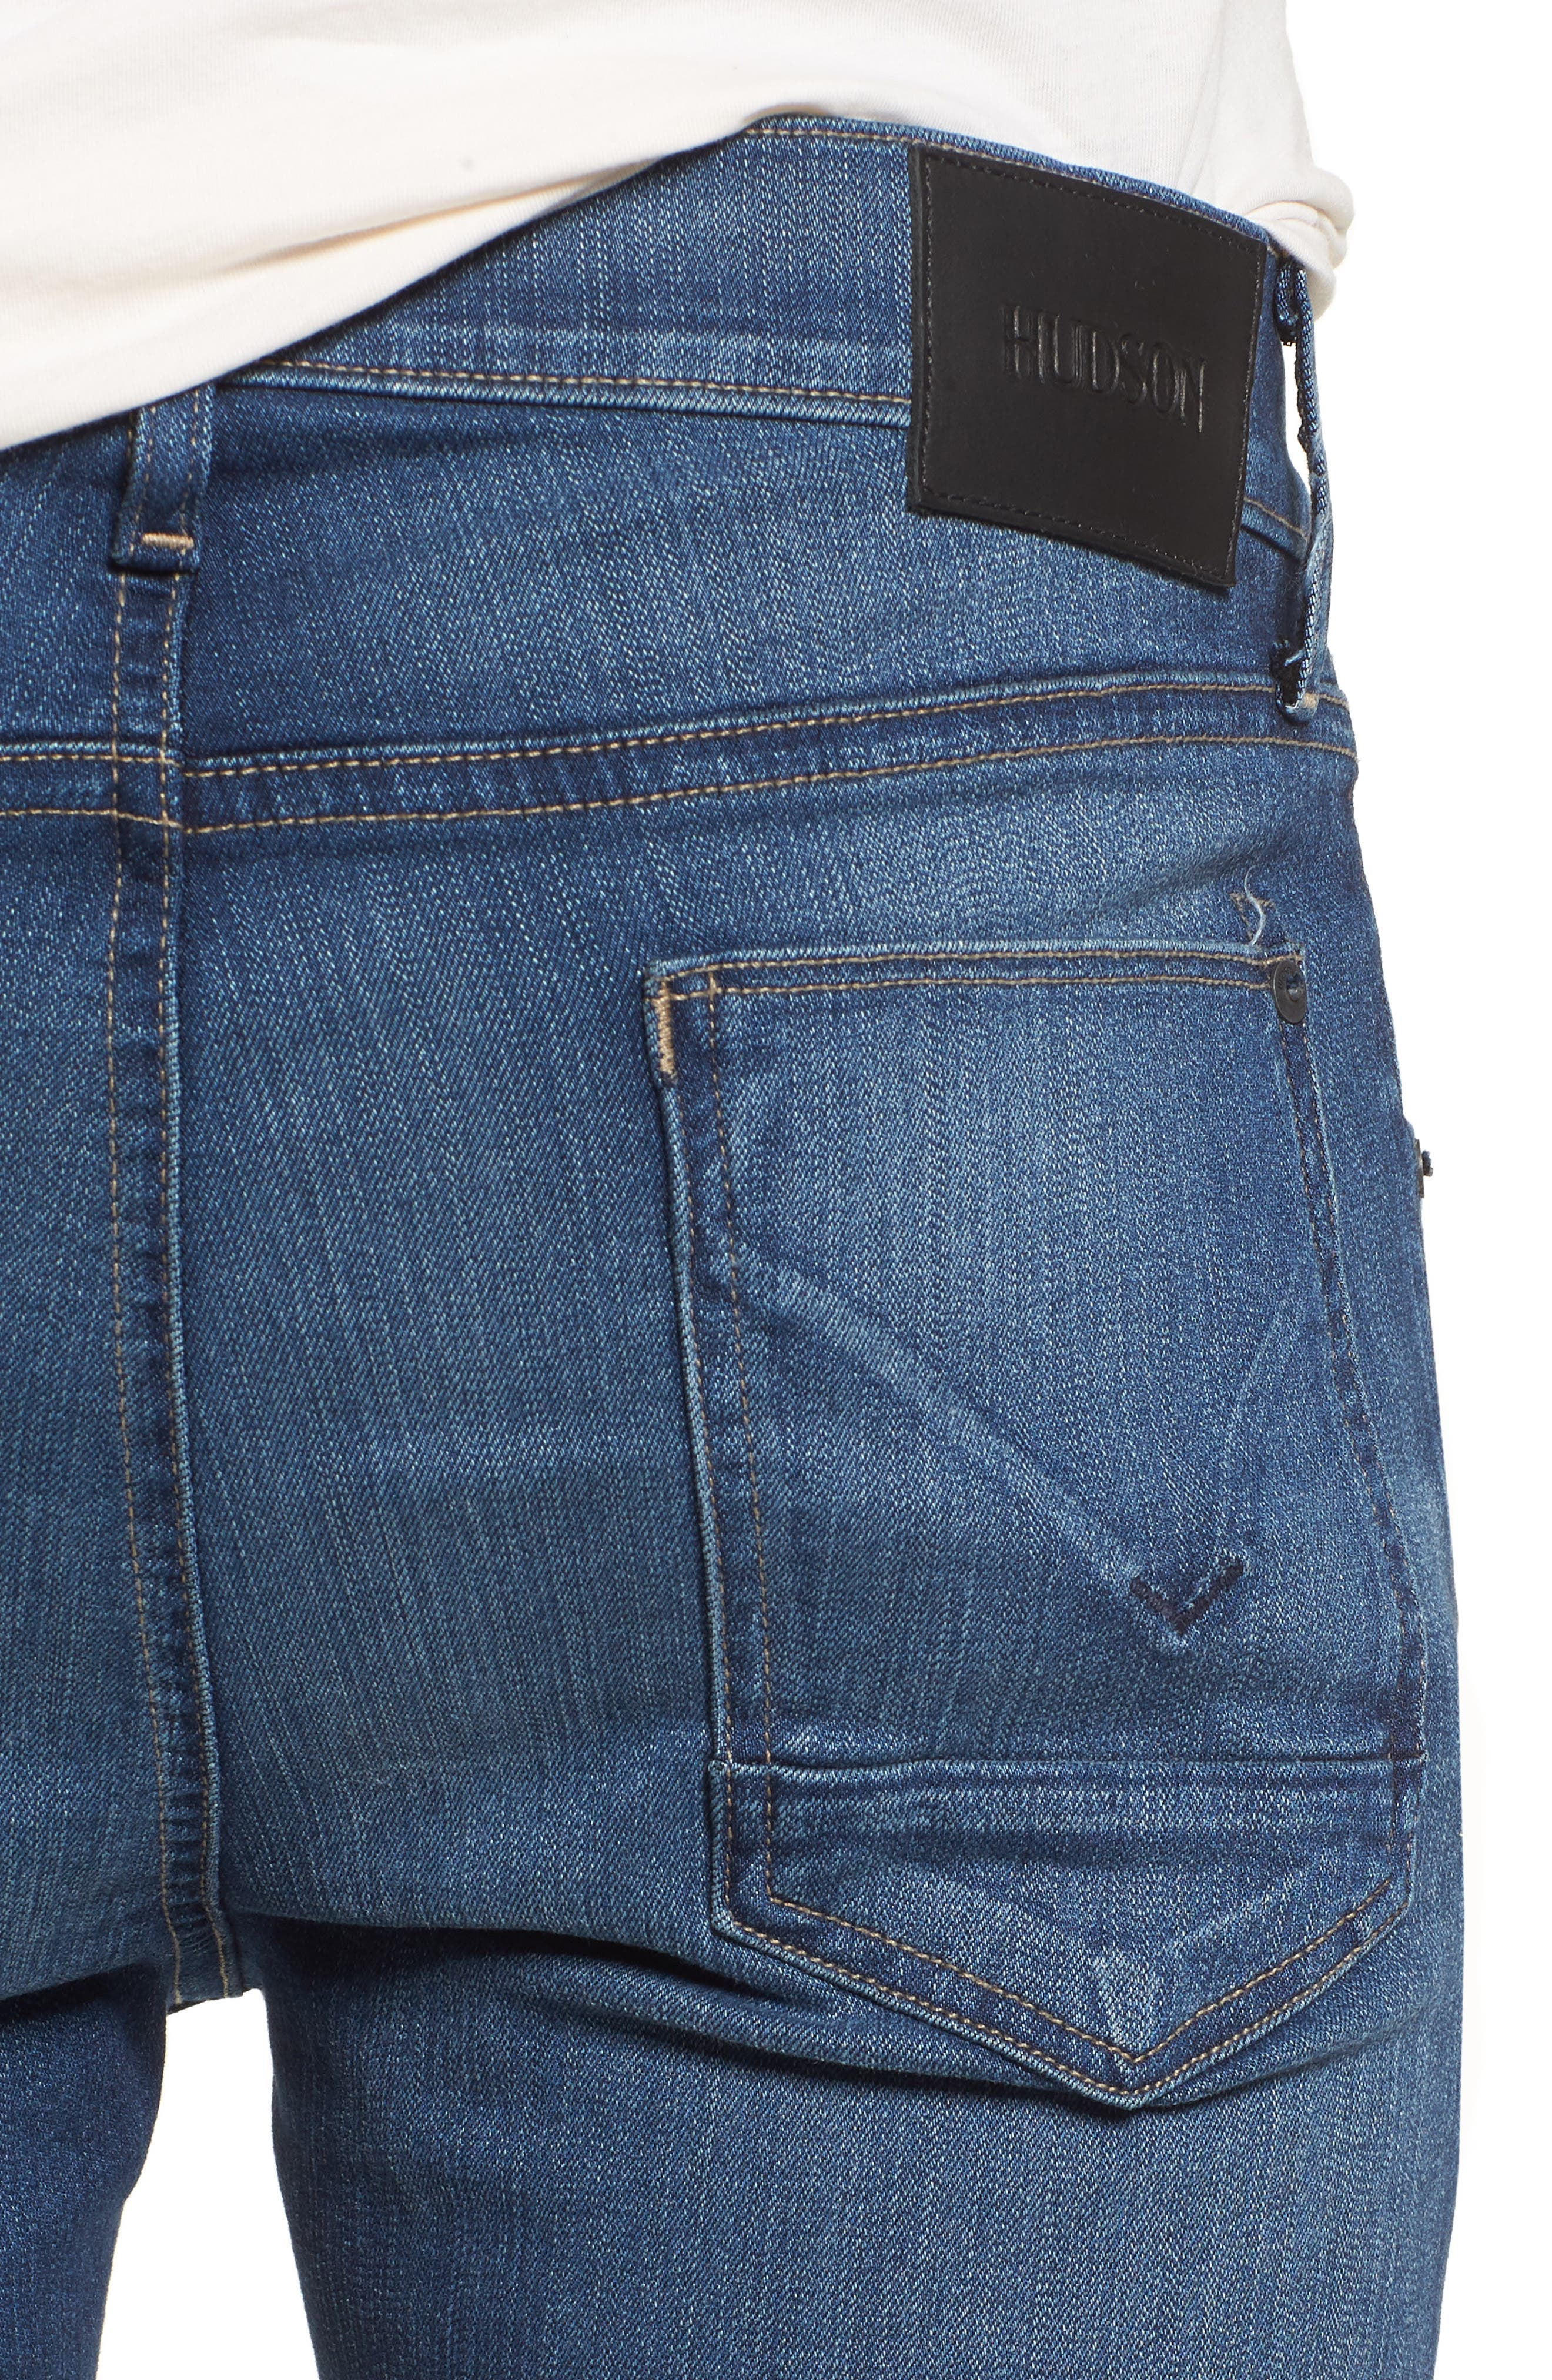 Hudson Blake Slim Fit Jeans,                             Alternate thumbnail 4, color,